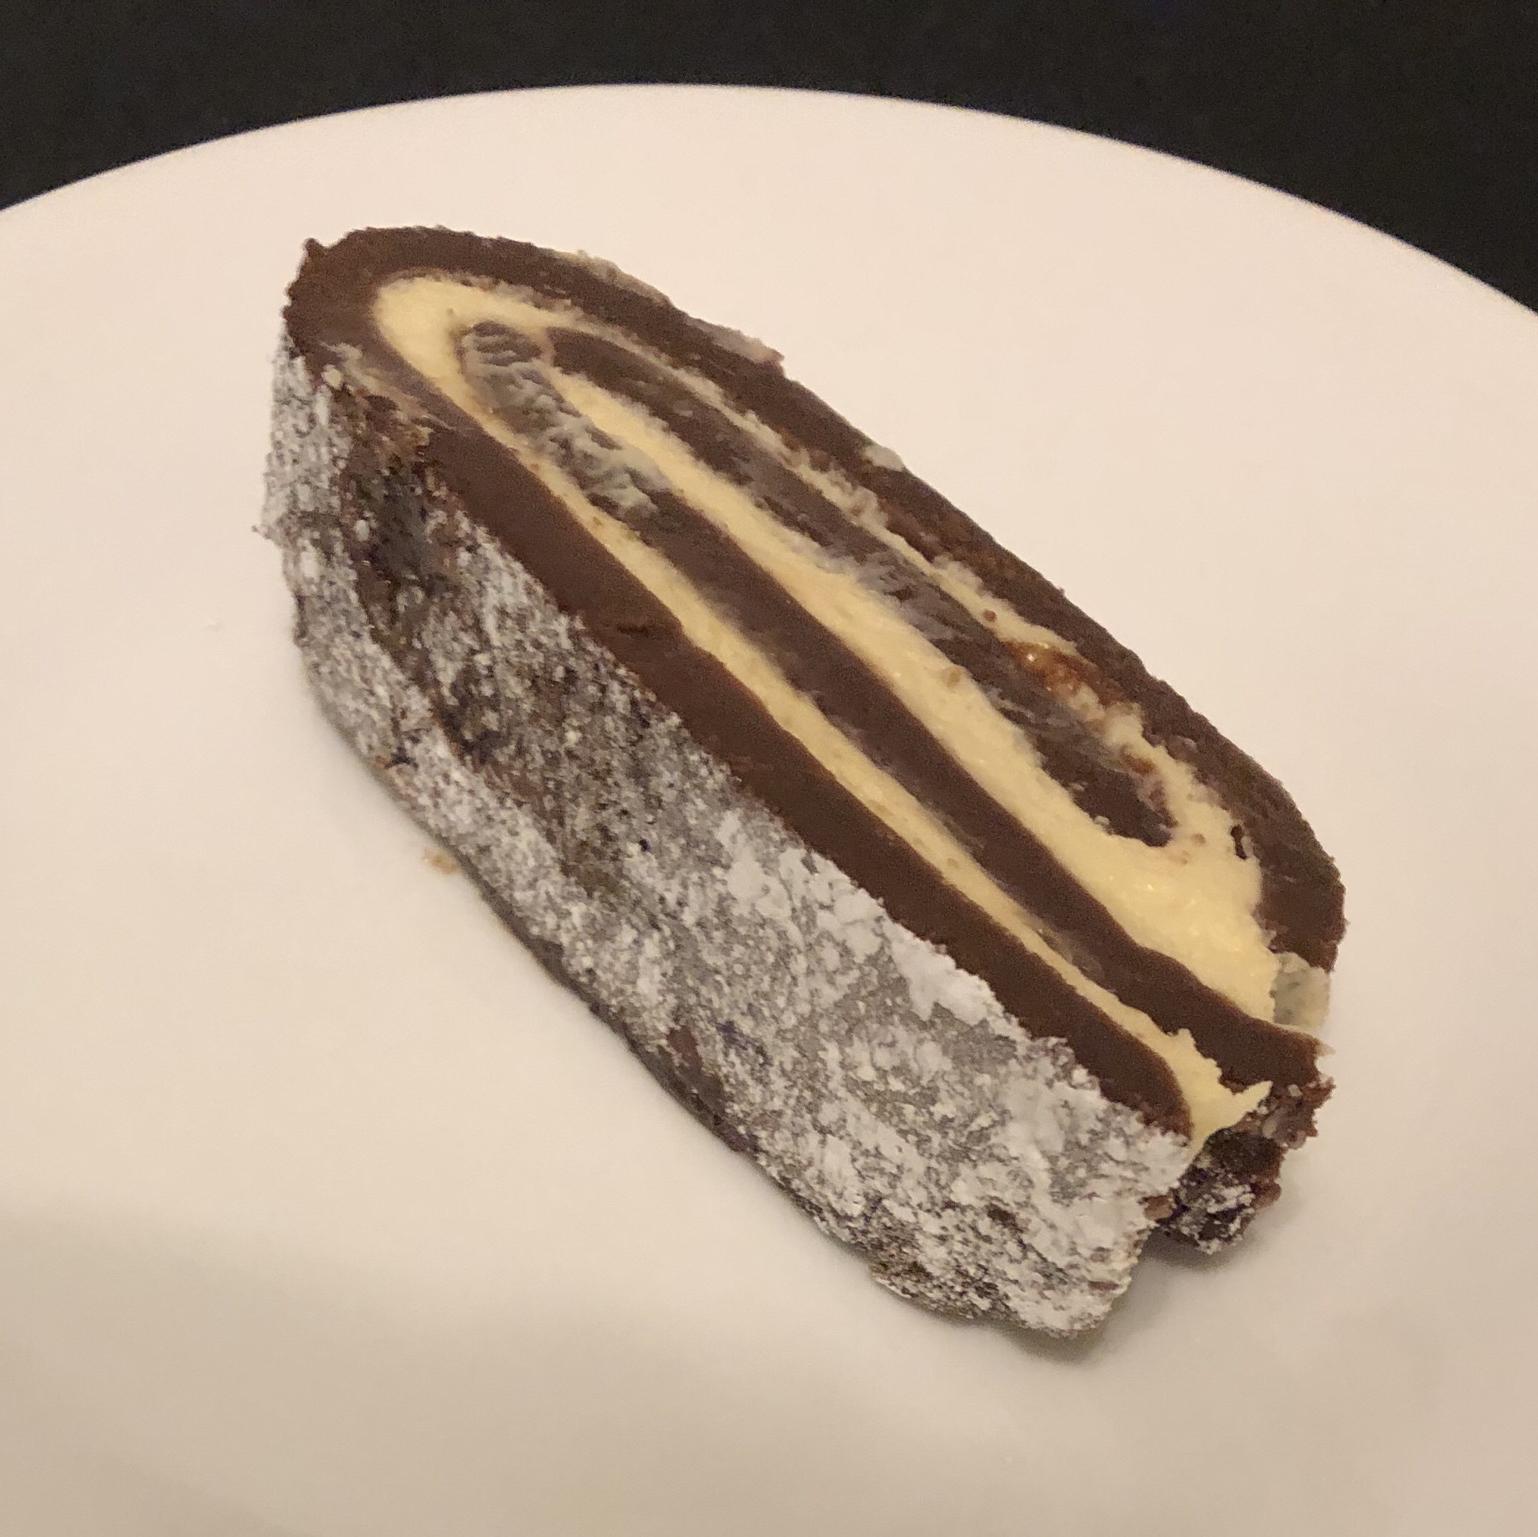 Chocolate Roll I